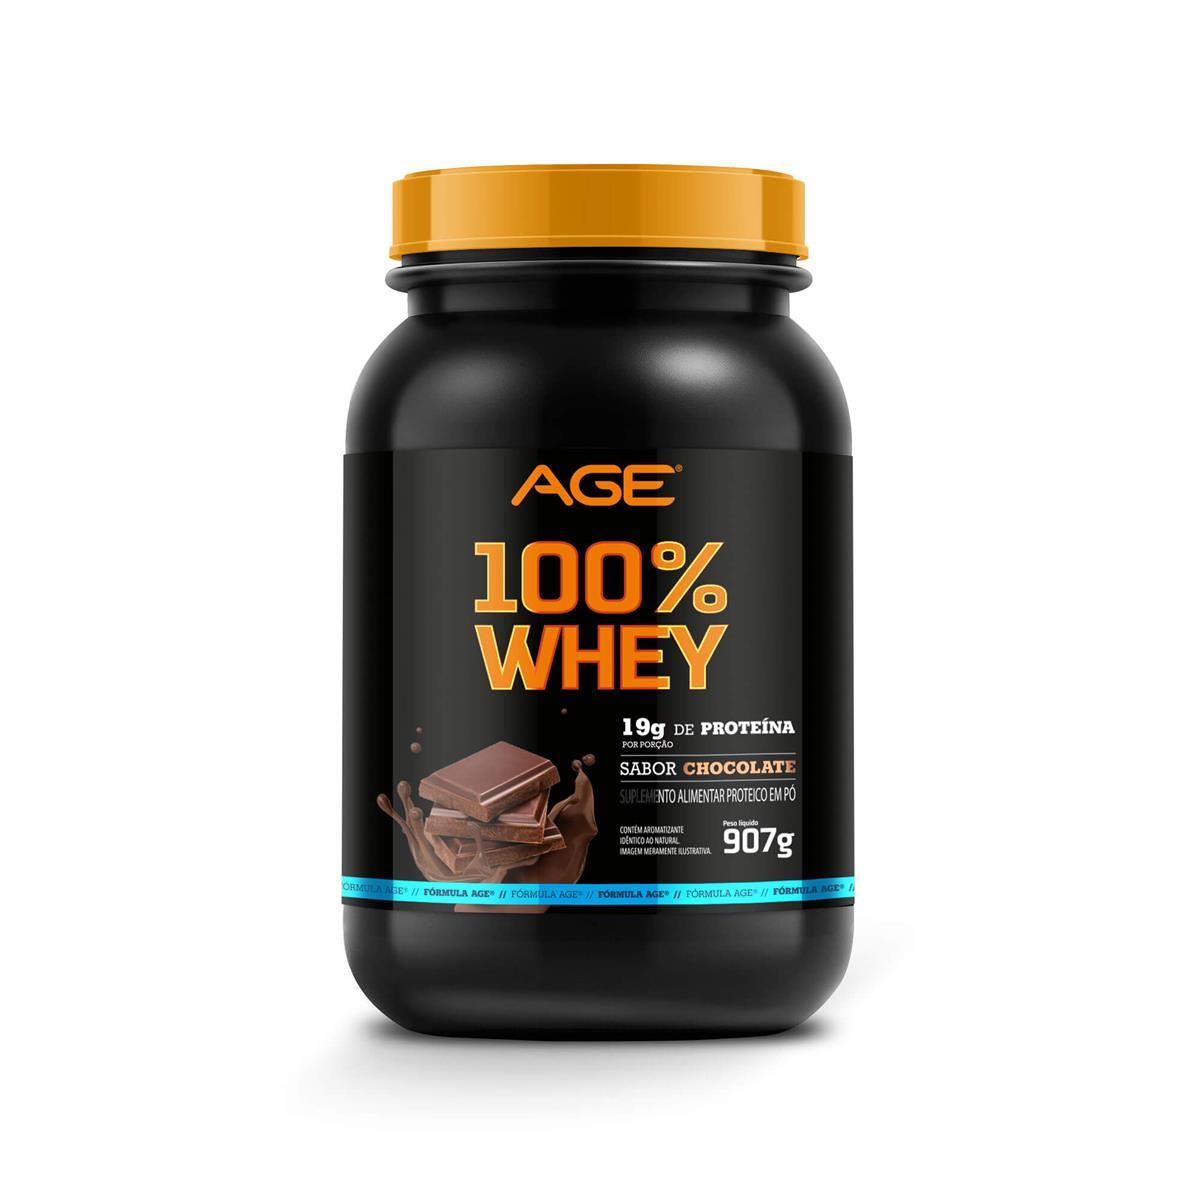 WHEY 100% PURE (907g) - Chocolate - AGE